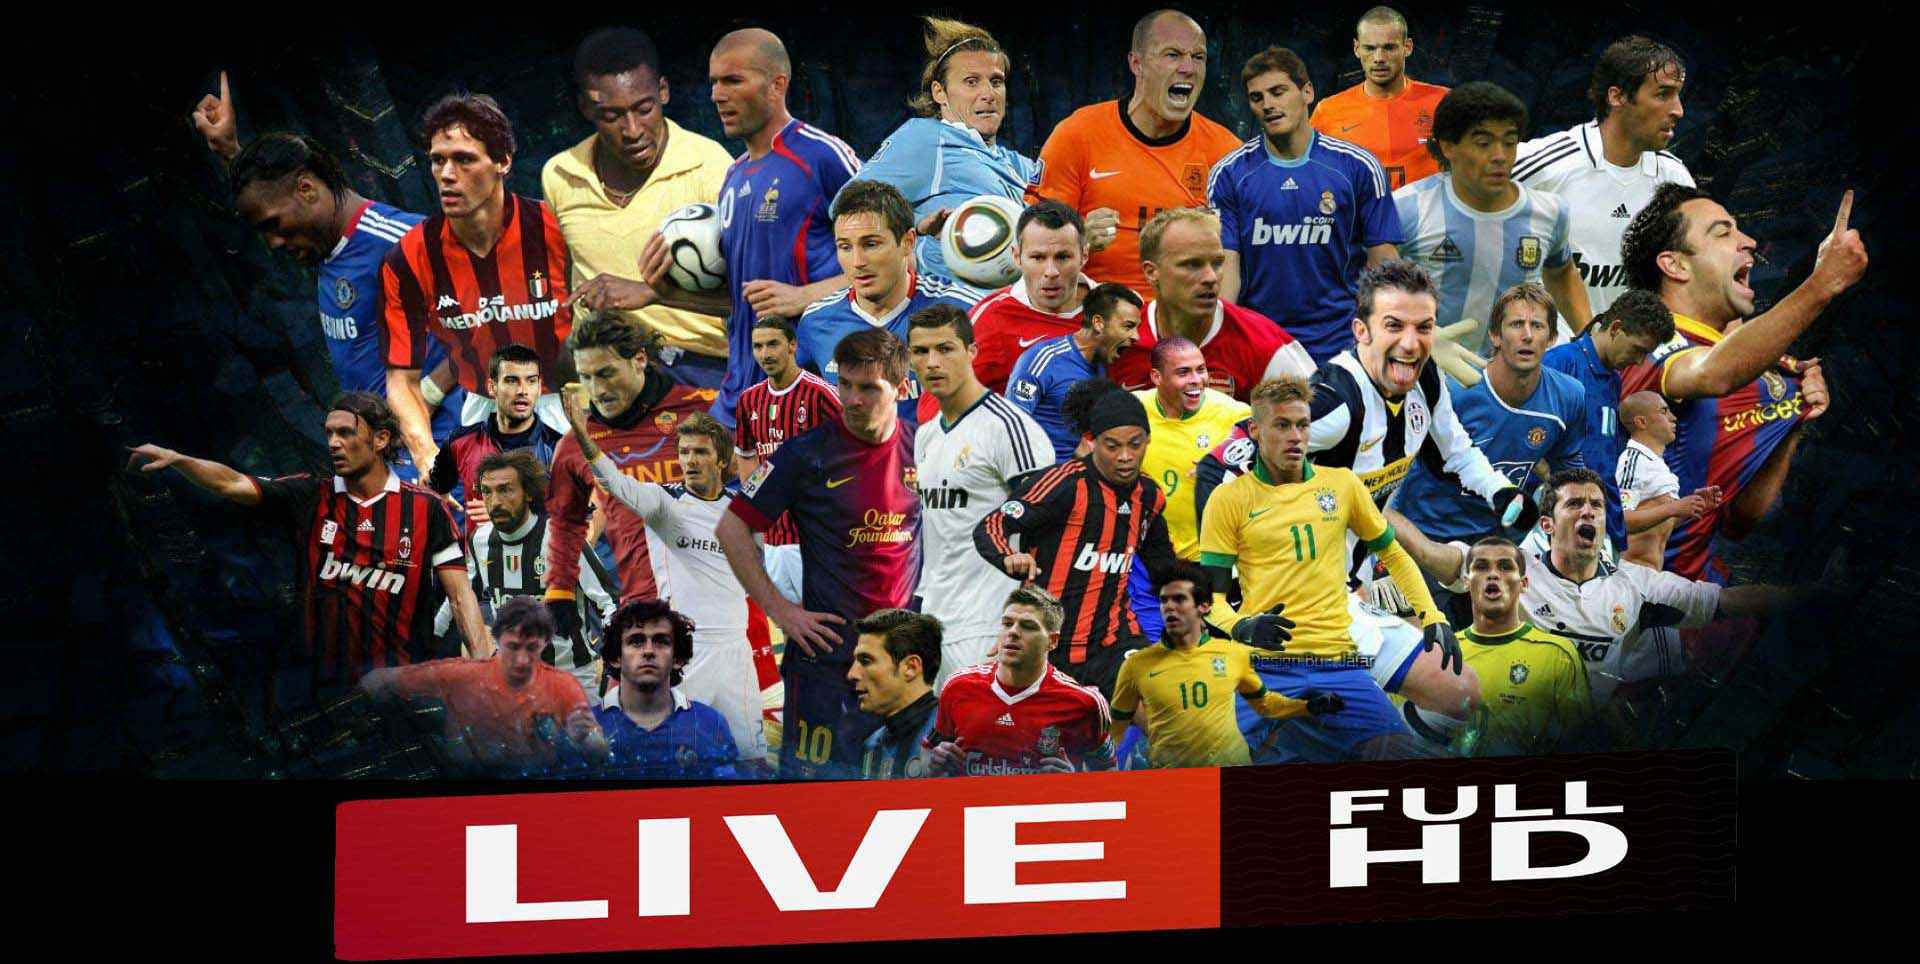 Sporting CP Vs Legia live